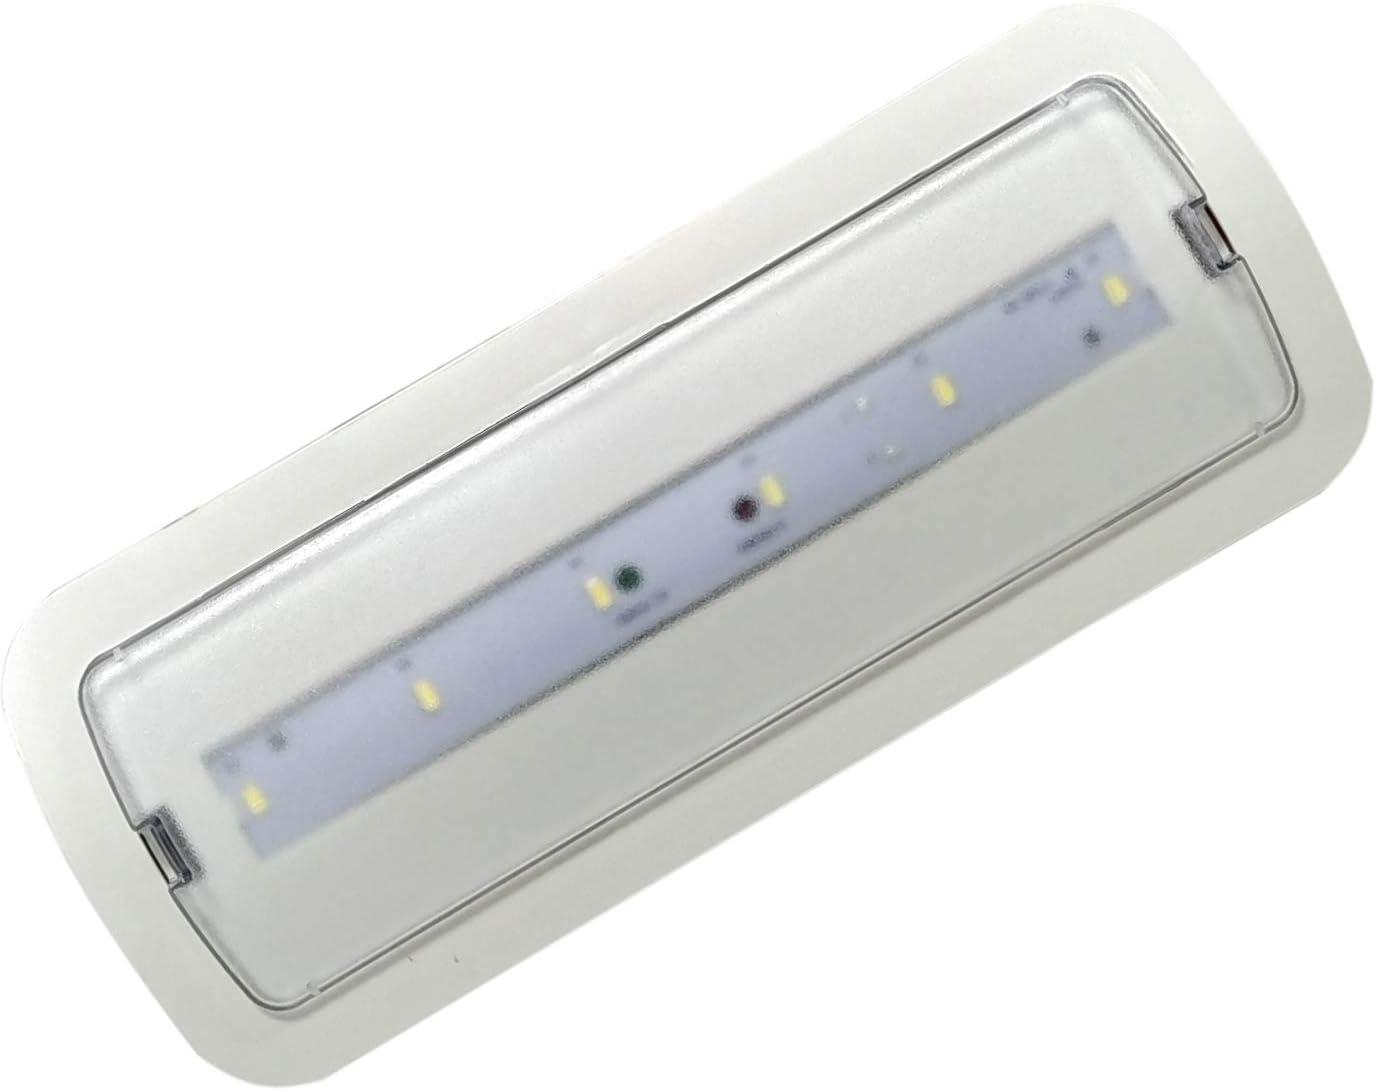 Pack 2x Luz de Emergencia LED empotrable o superficie 3W, 200 Lumenes. 3 Horas de Autonomía. Color Blanco Frío (6500K).